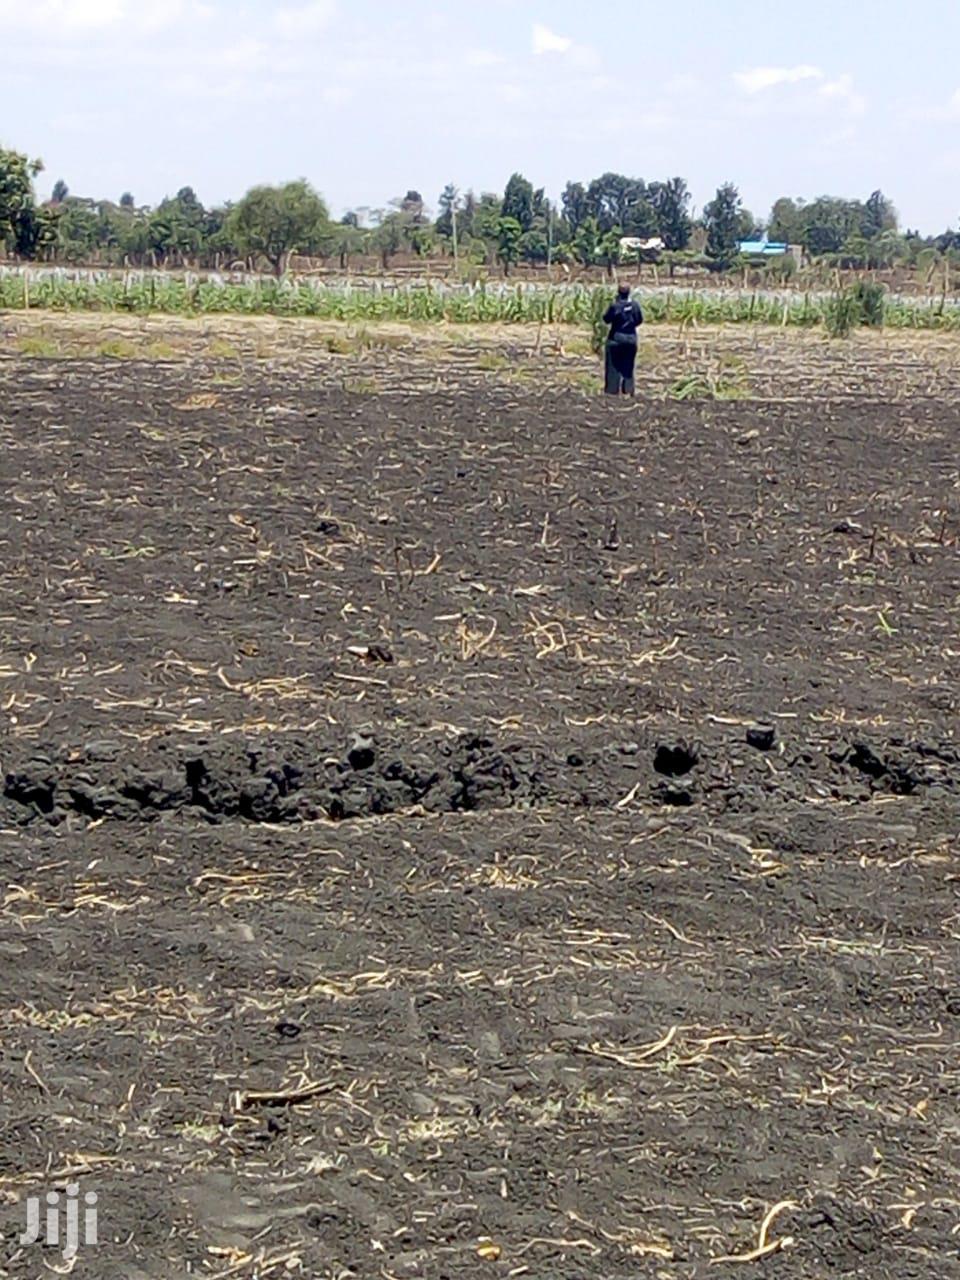 50*100 Plot For Sale | Land & Plots For Sale for sale in Mutithi, Kirinyaga, Kenya